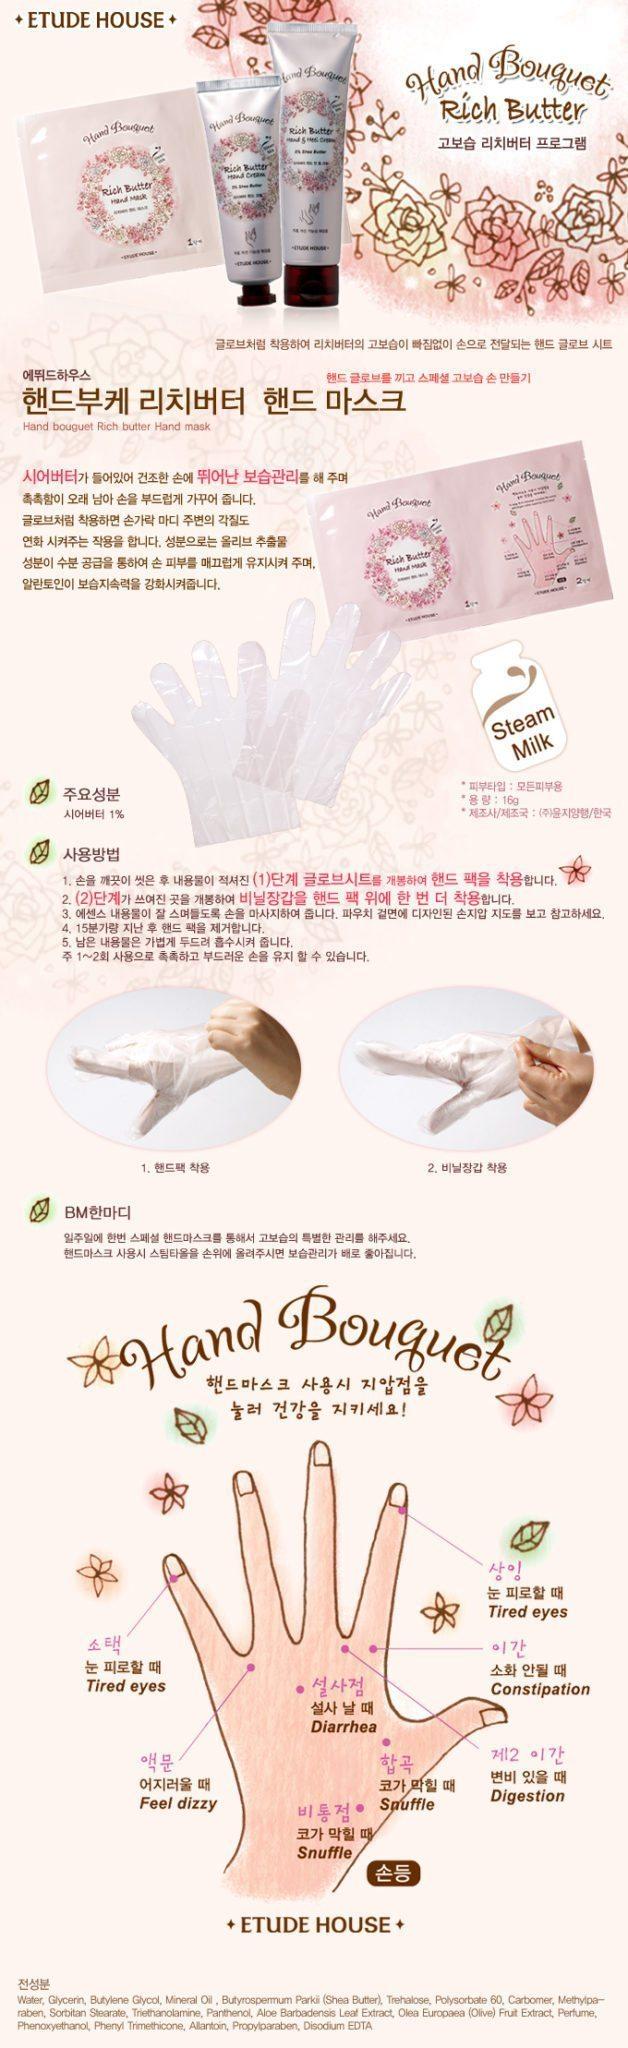 Etude House Hand Bouquet Rich Butter Hand Mask 16g malaysia